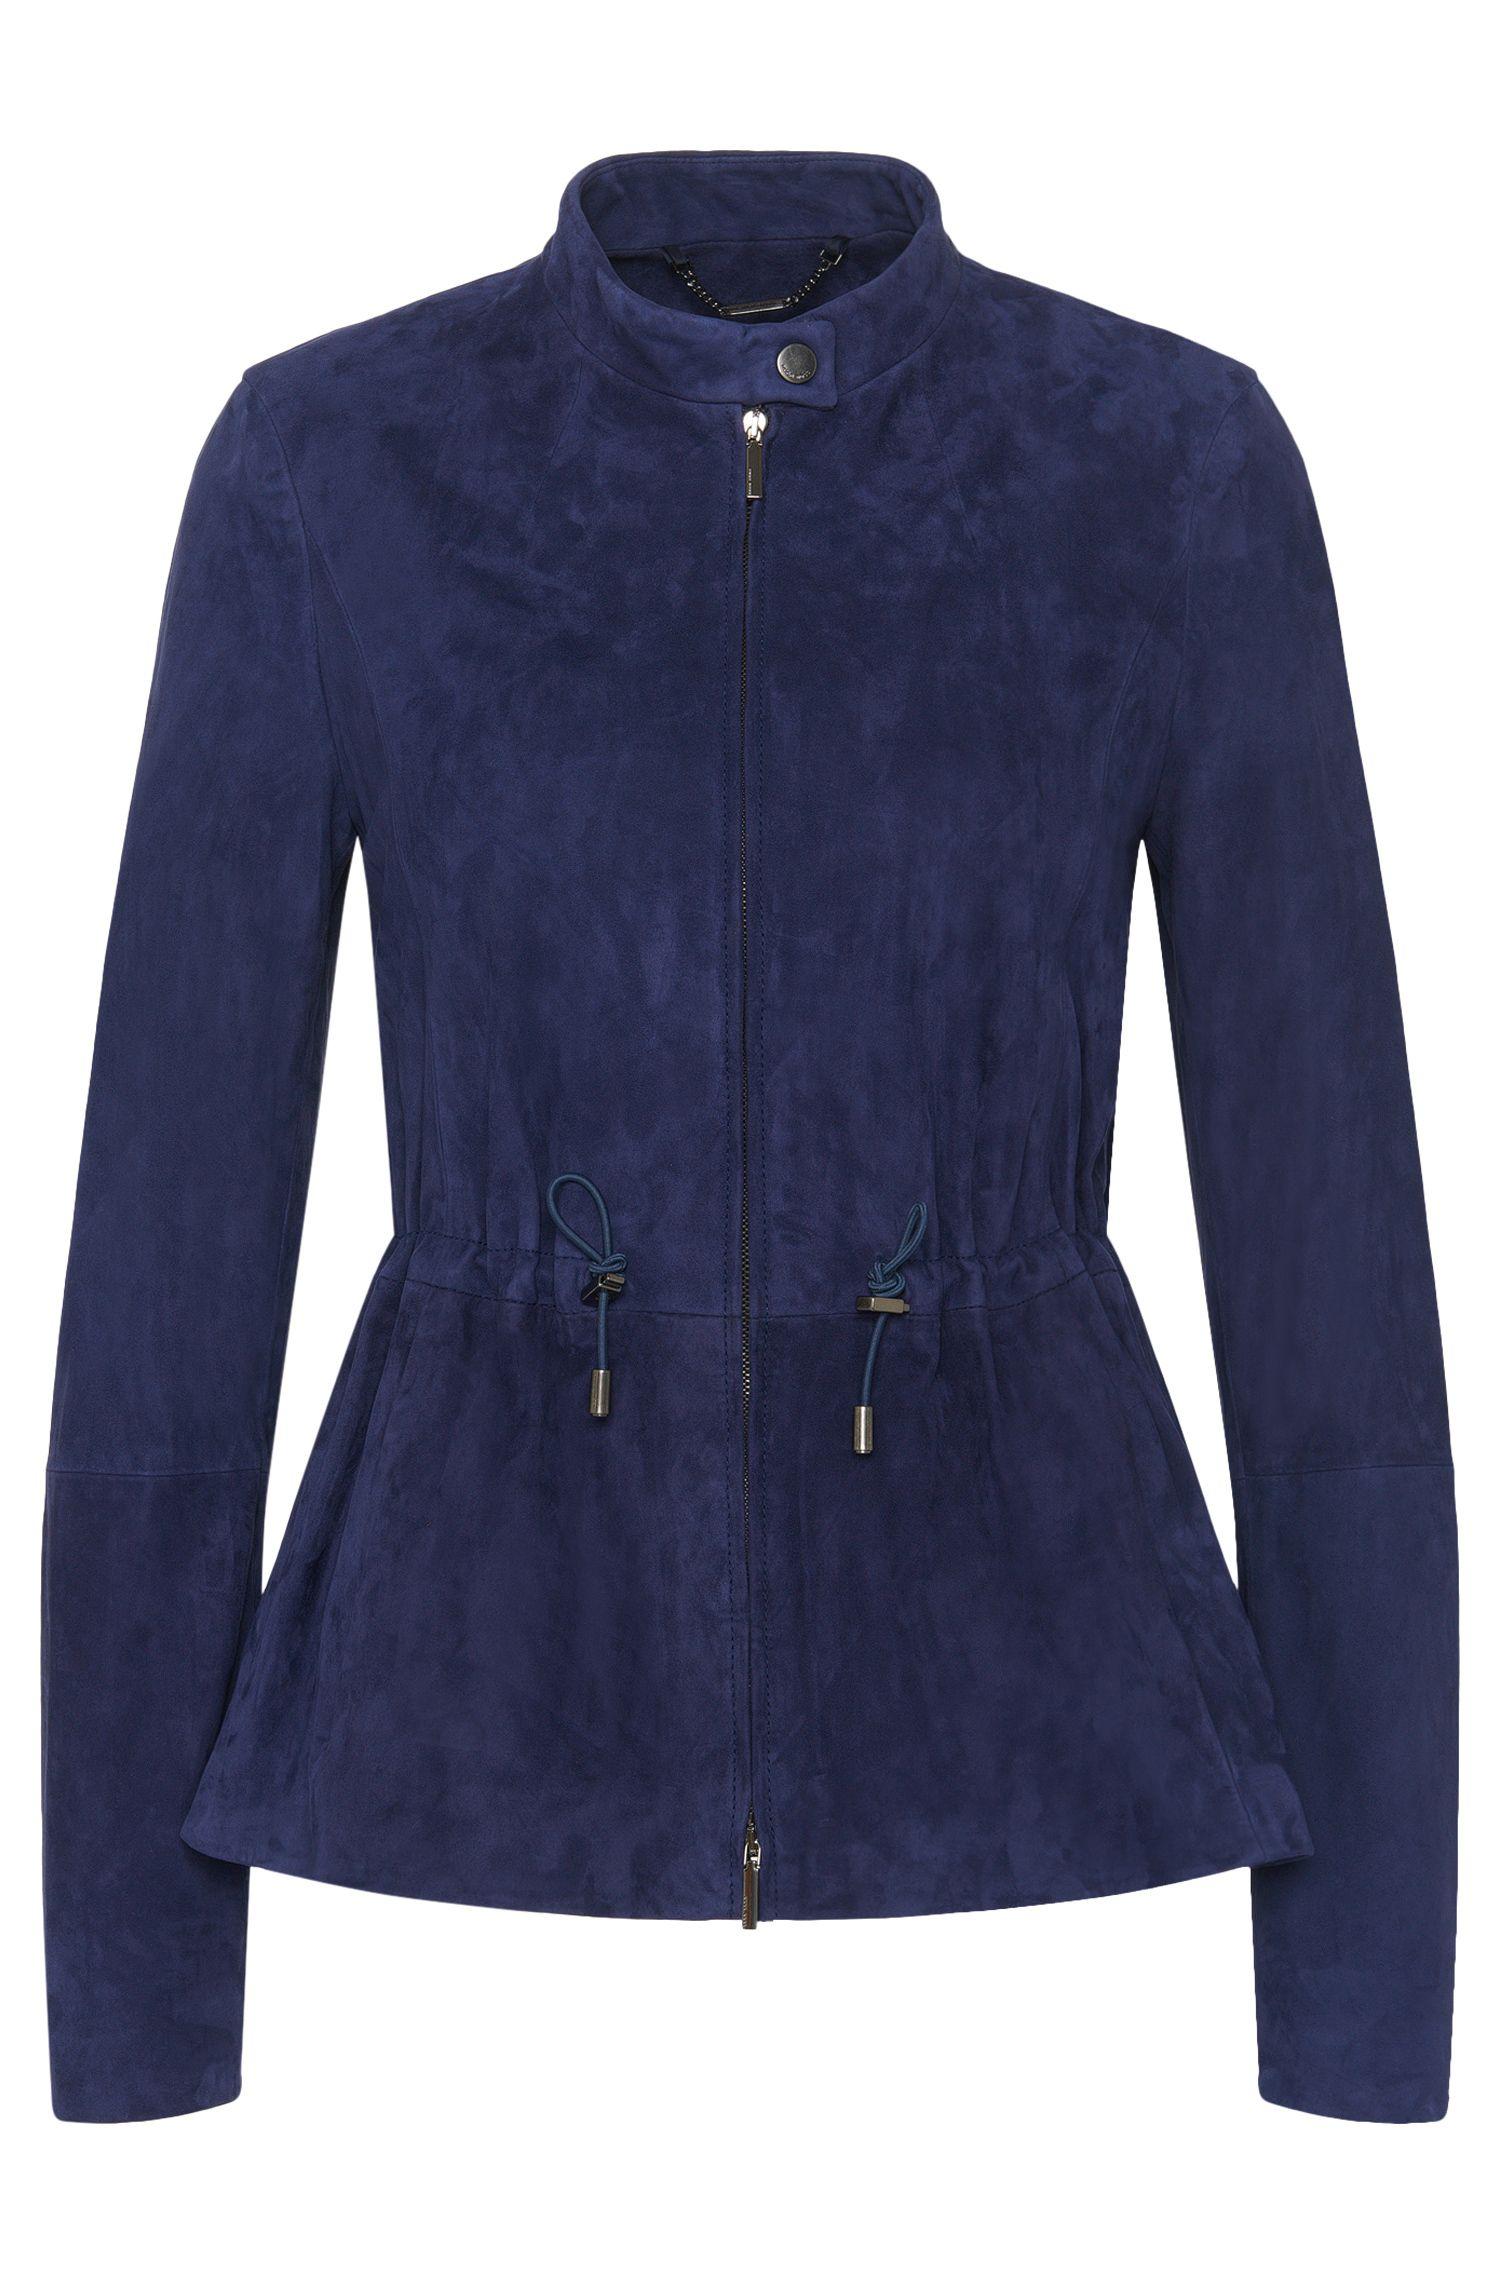 'Salova' | Lamb Leather Drawstring Peplum Jacket